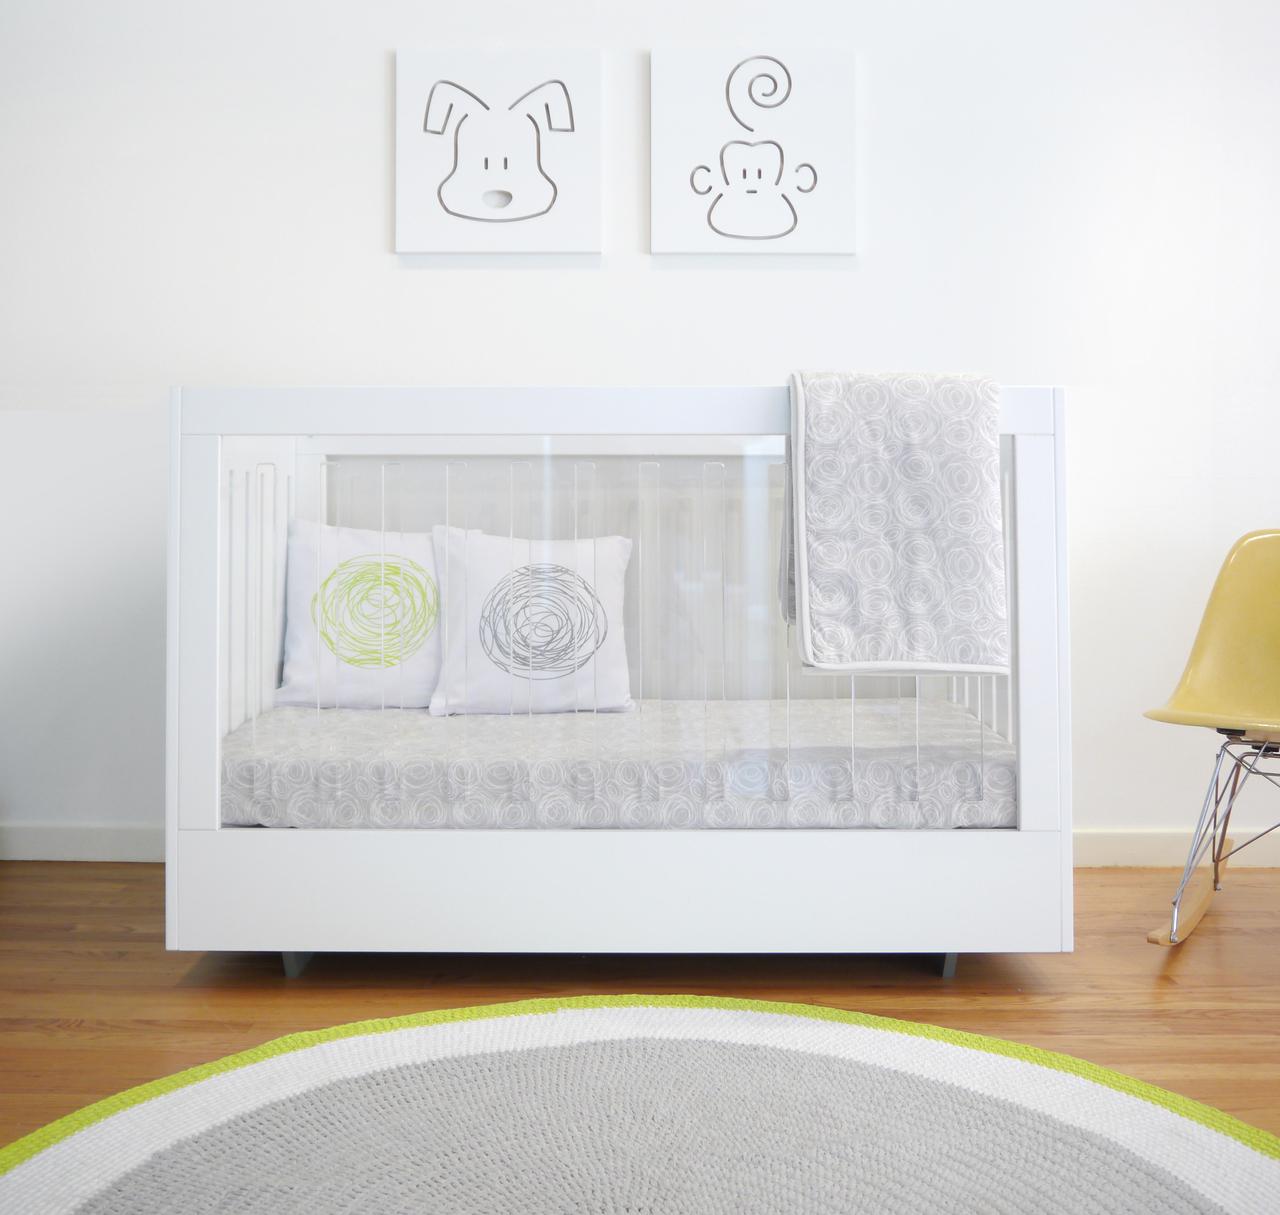 acrylic nursery decor  project nursery - roh crib from spot on square